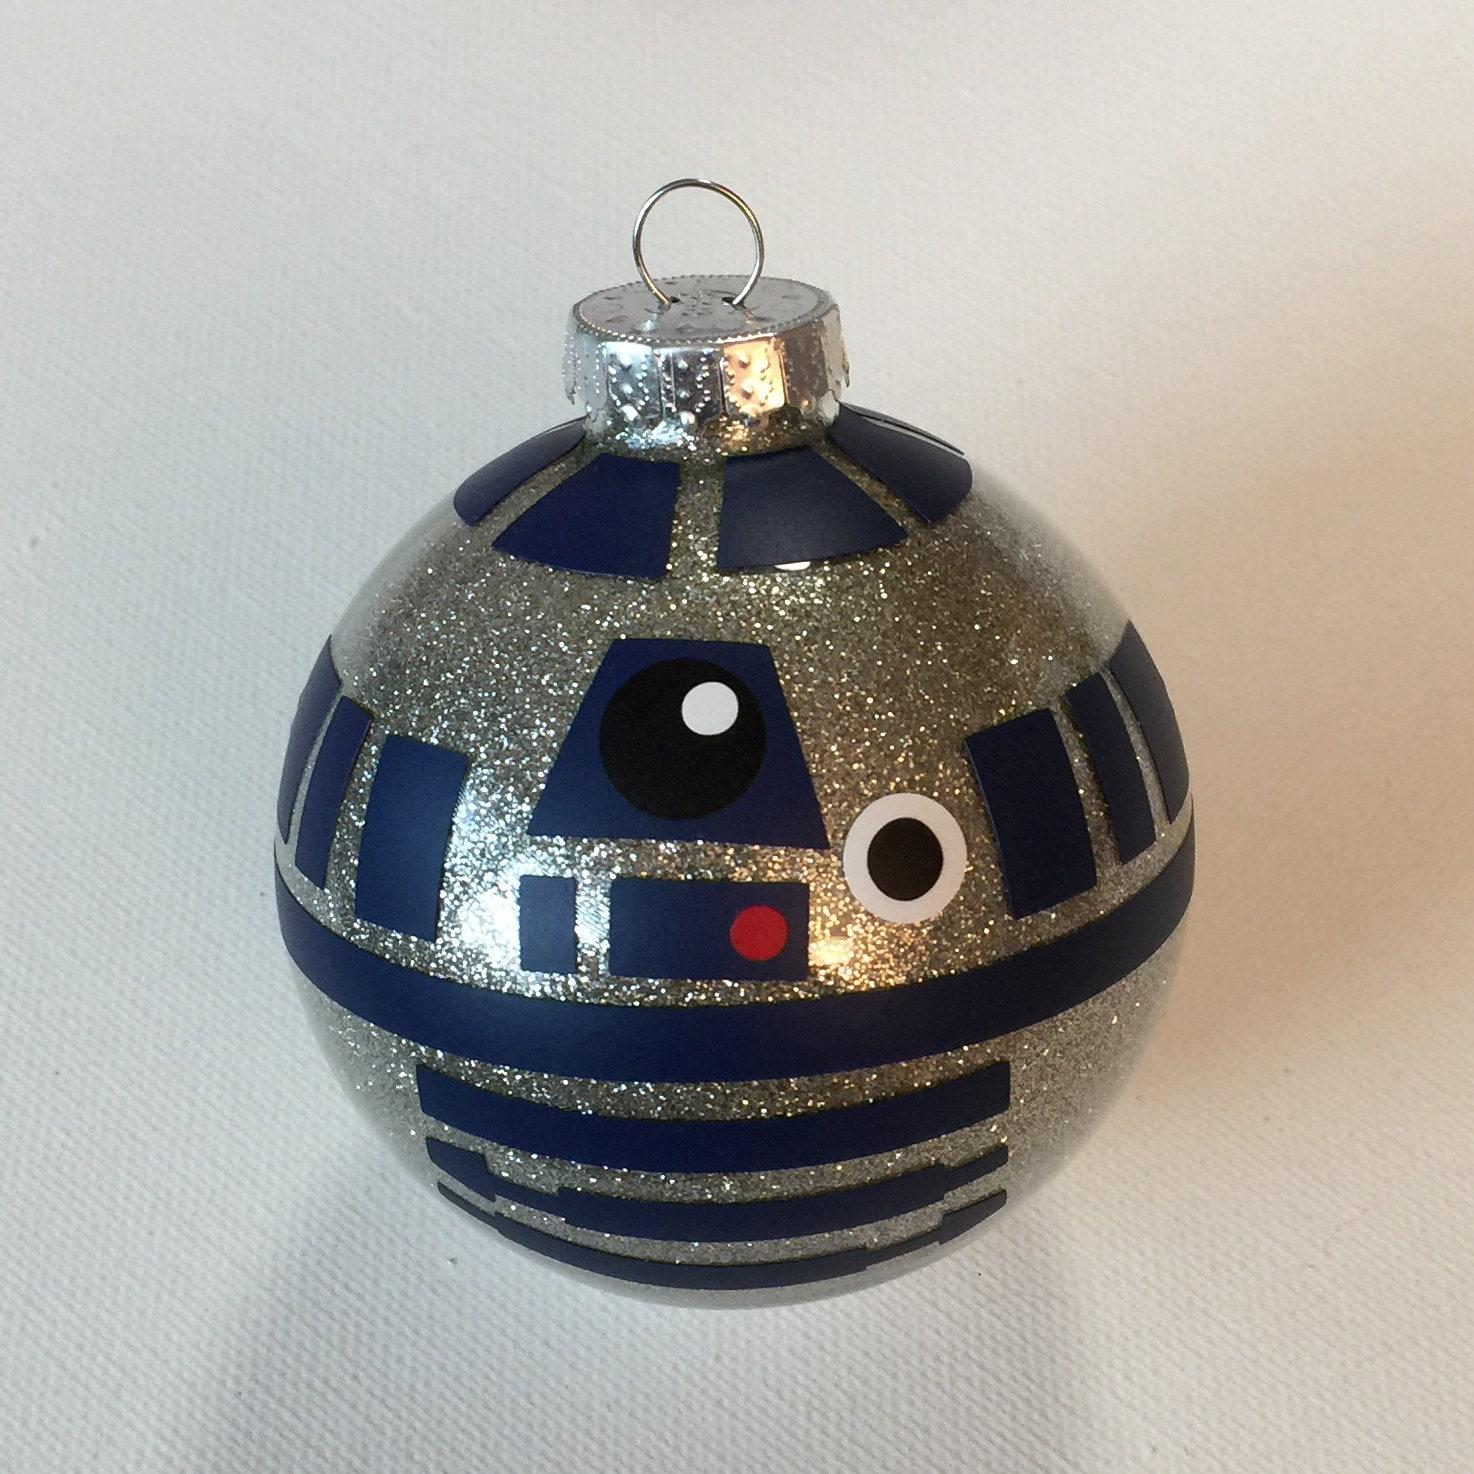 Star Wars Christmas Tree Lights: Star Wars Inspired R2D2 Christmas Glitter Ornament 3.25